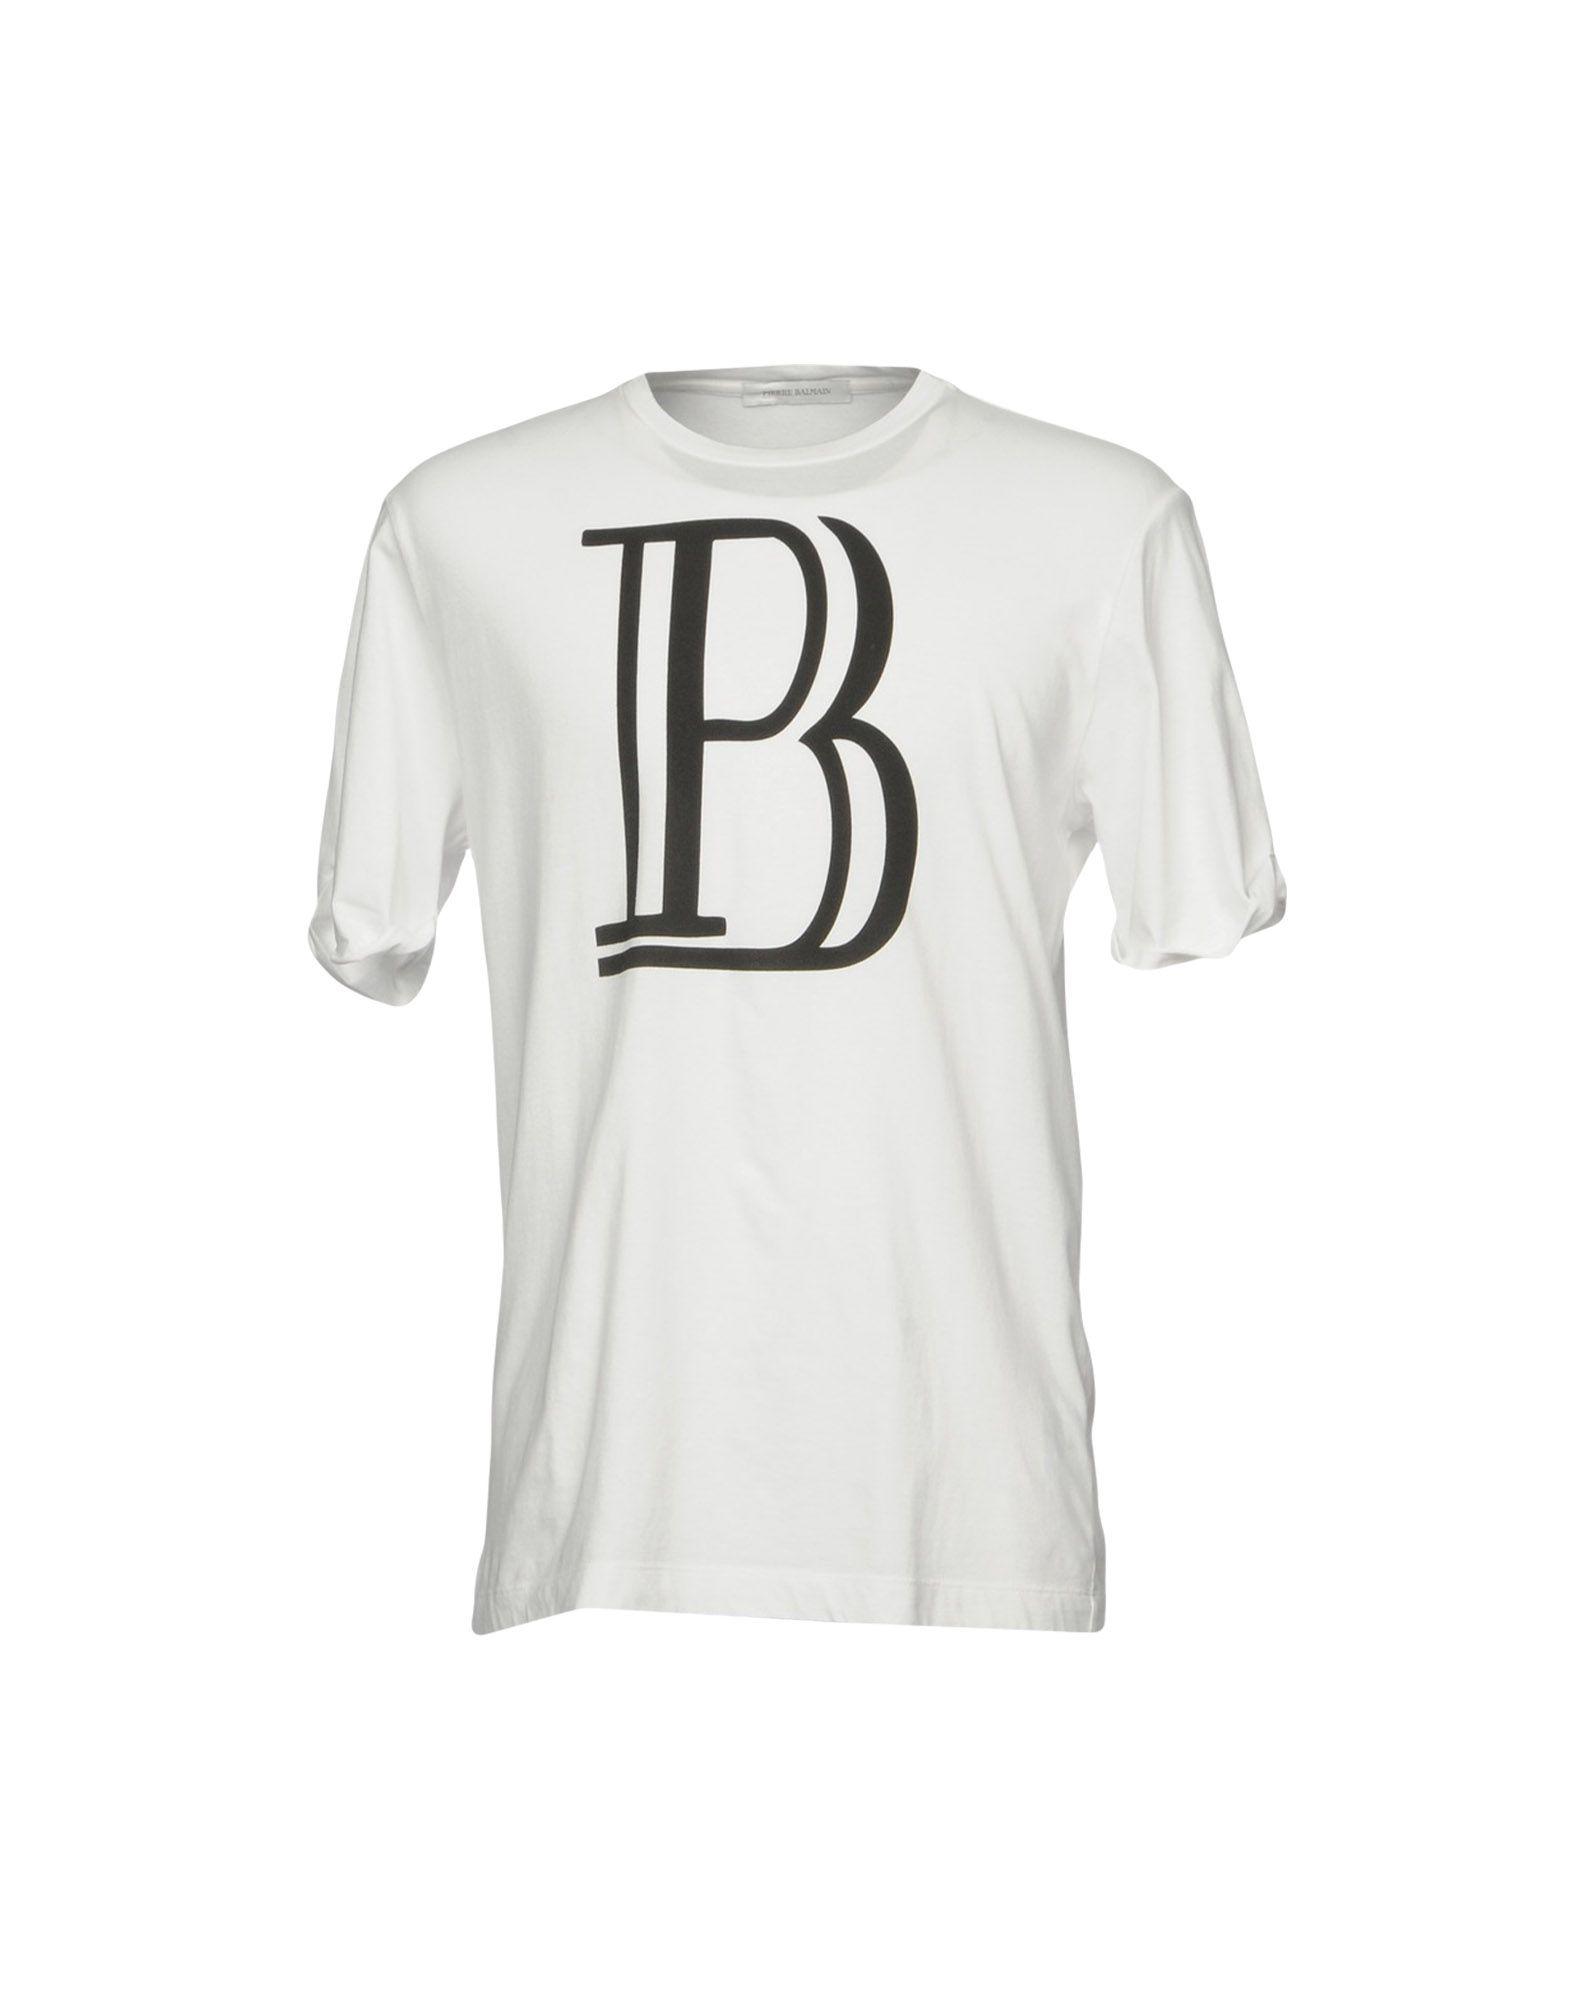 T-Shirt Pierre Balmain Uomo - Acquista online su